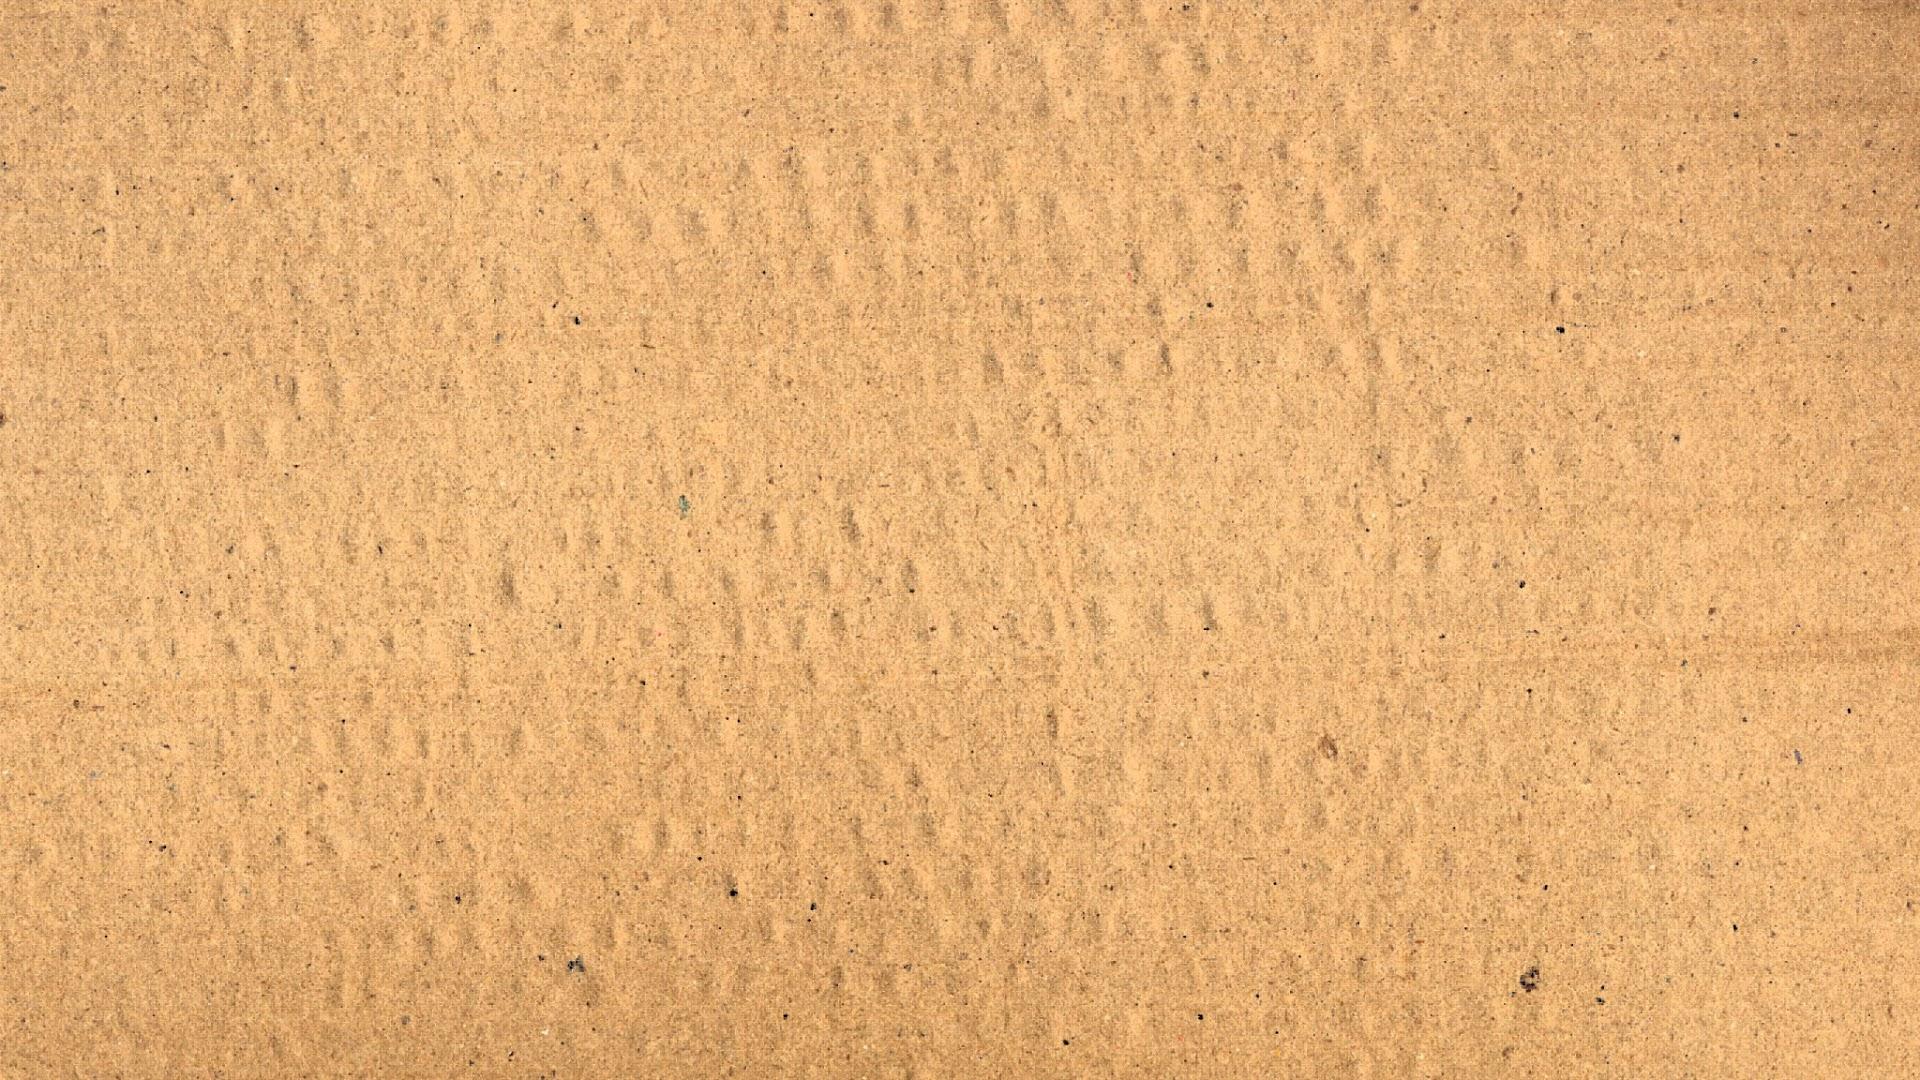 Brown Carton Board Background